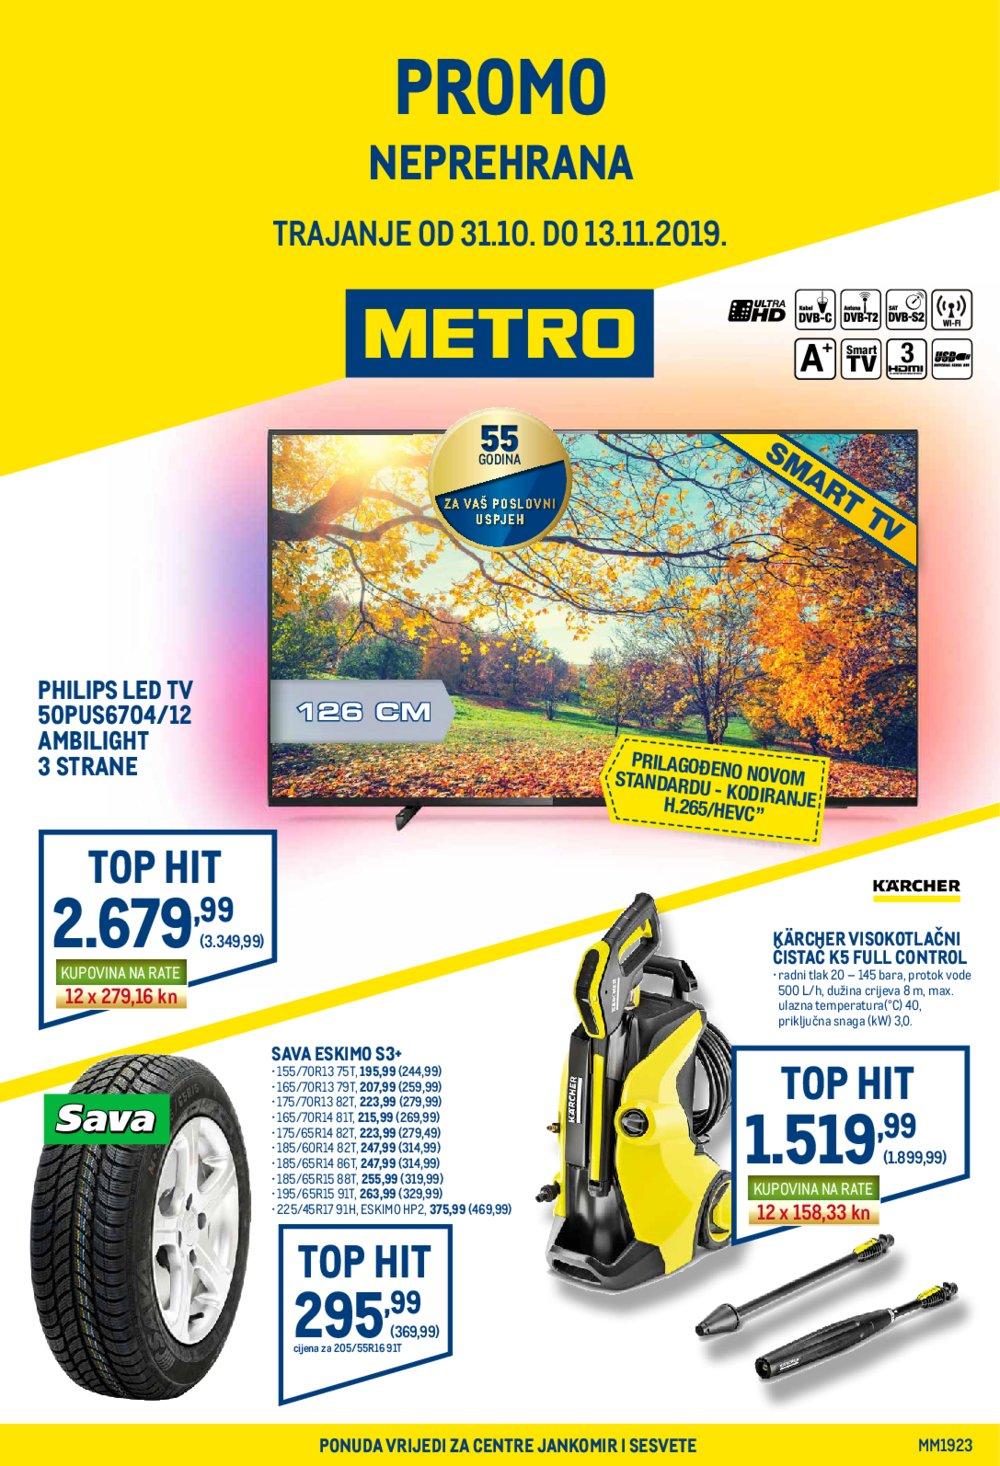 Metro katalog Akcija Neprehrana 31.10.-13.11.2019.